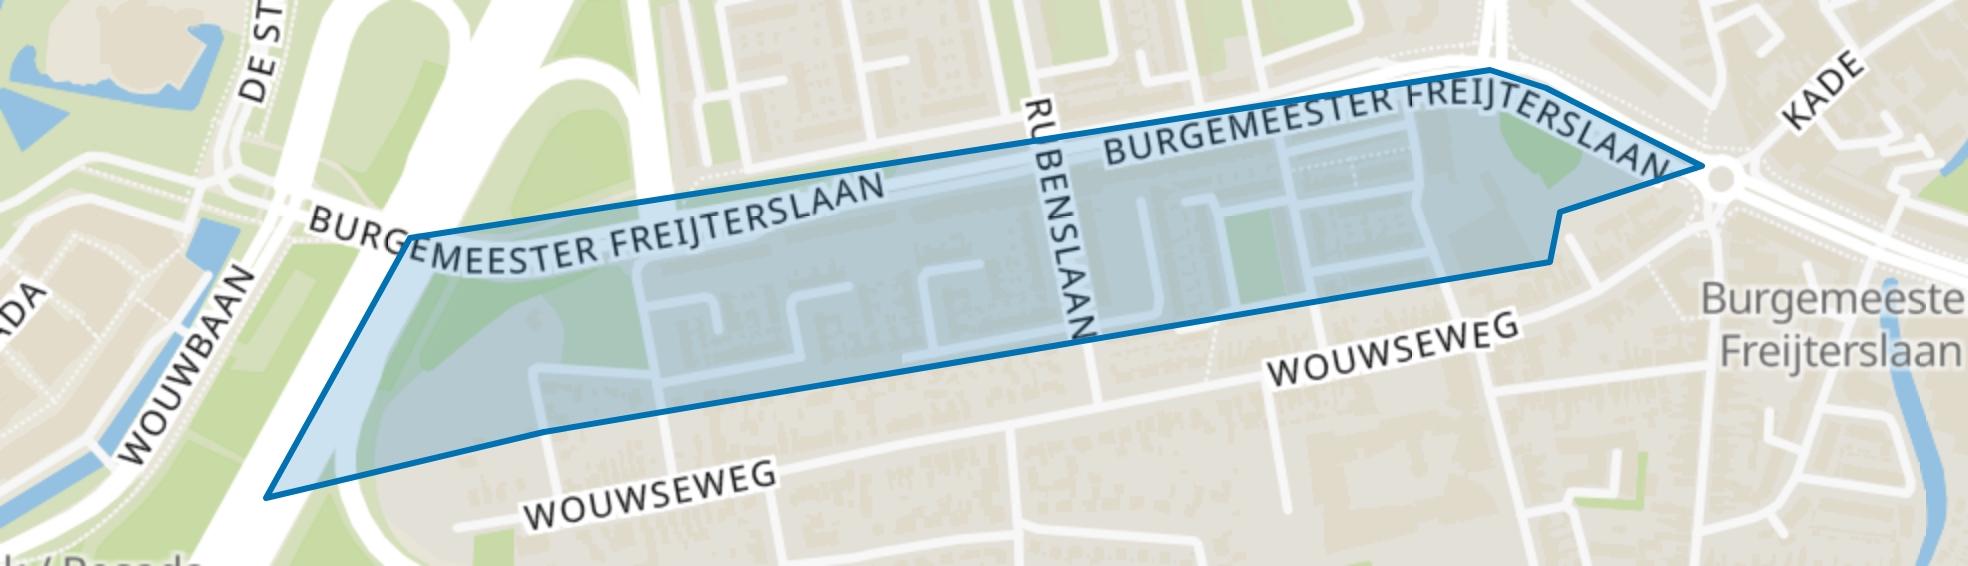 Herreweg, Roosendaal map